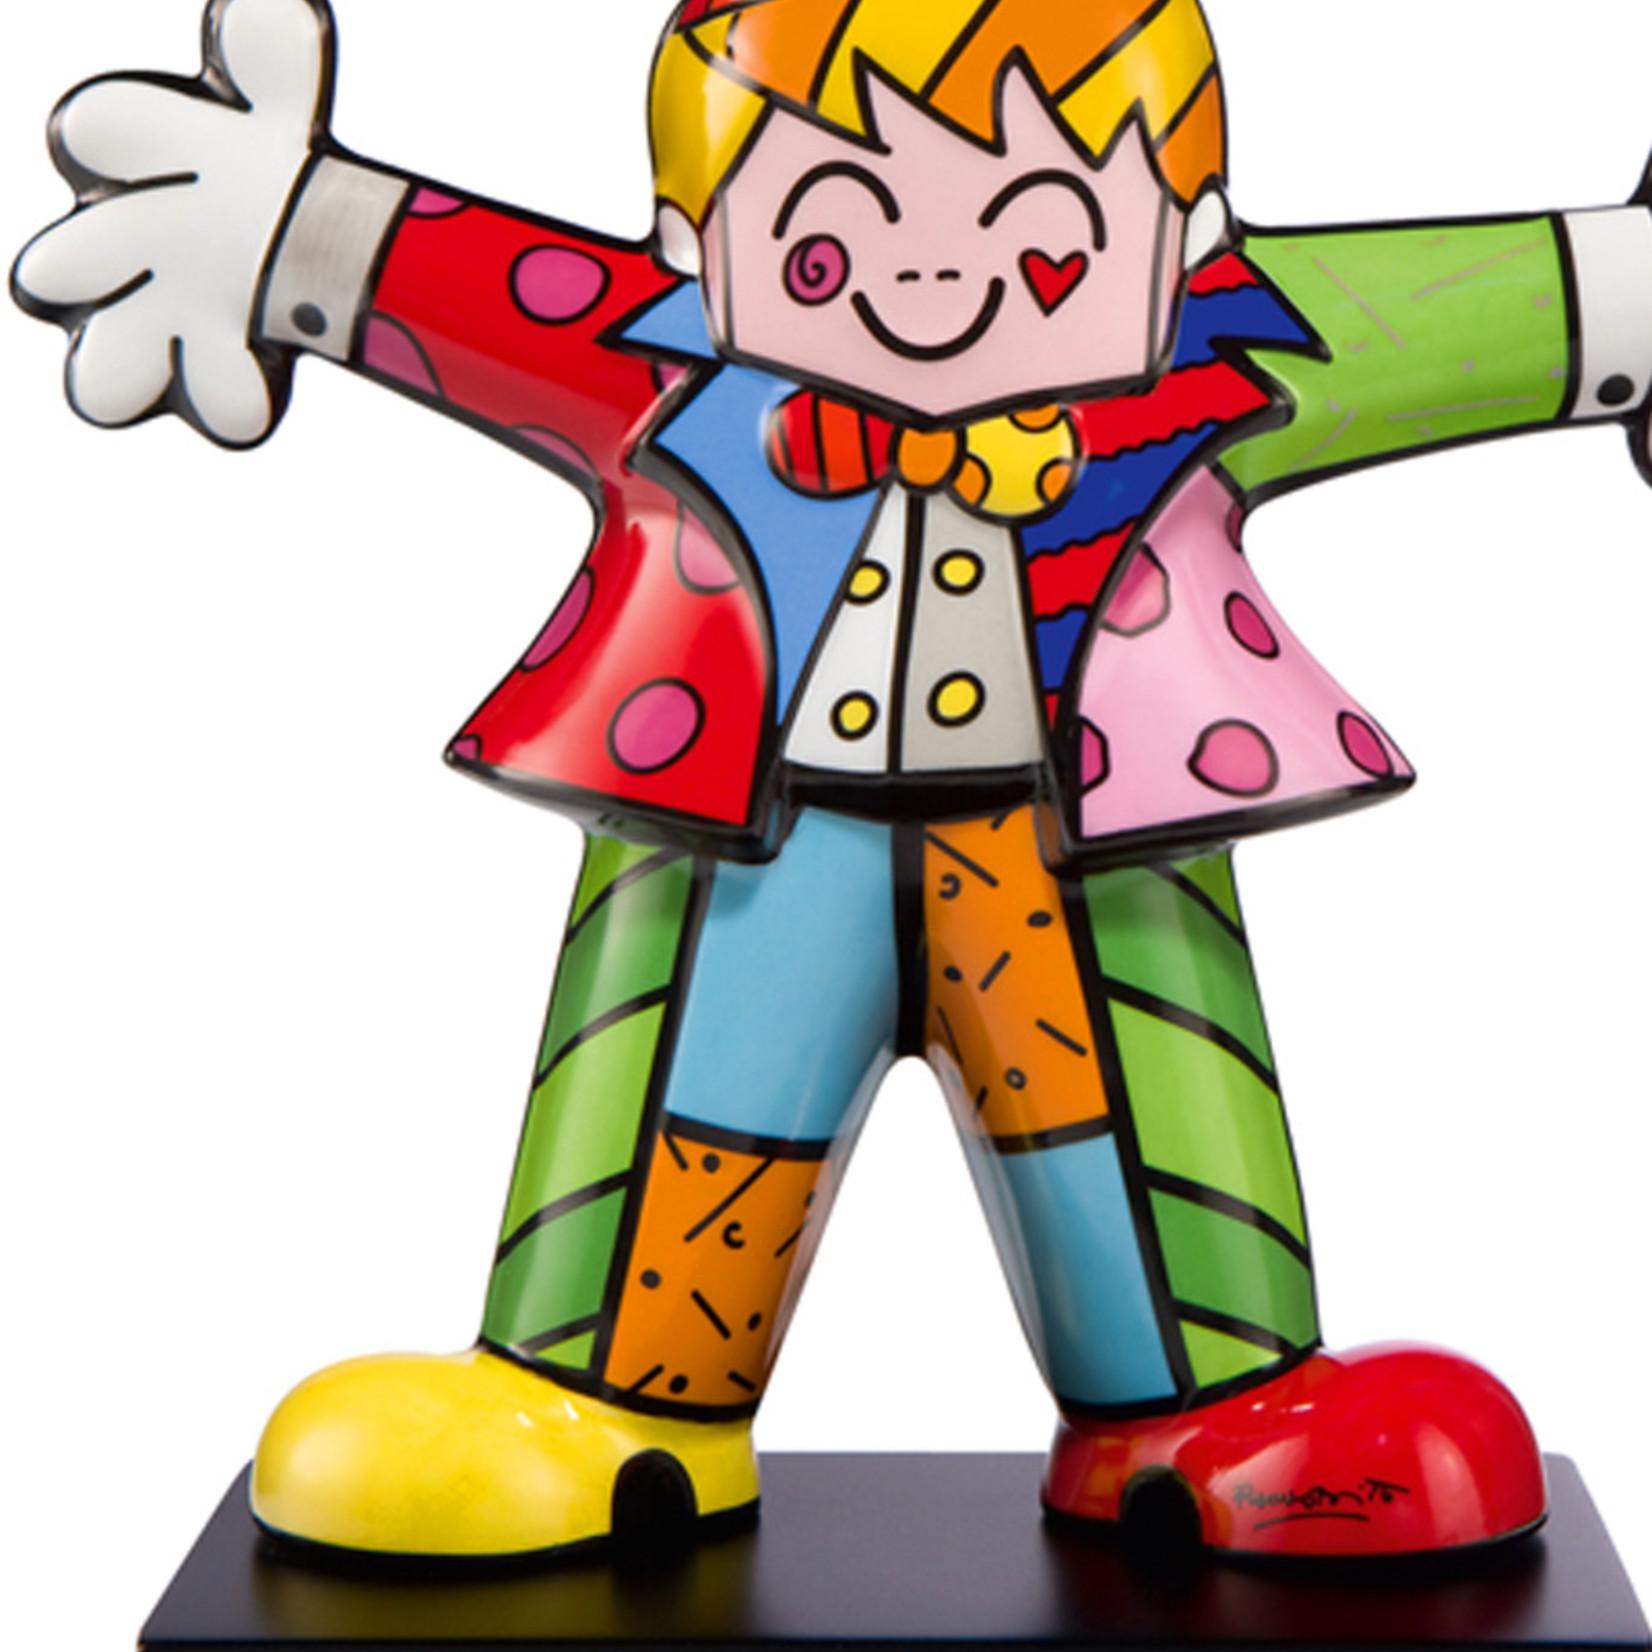 Goebel Porzellanmanufaktur Figur Hug Too   Romero Britto   Goebel Porzellan